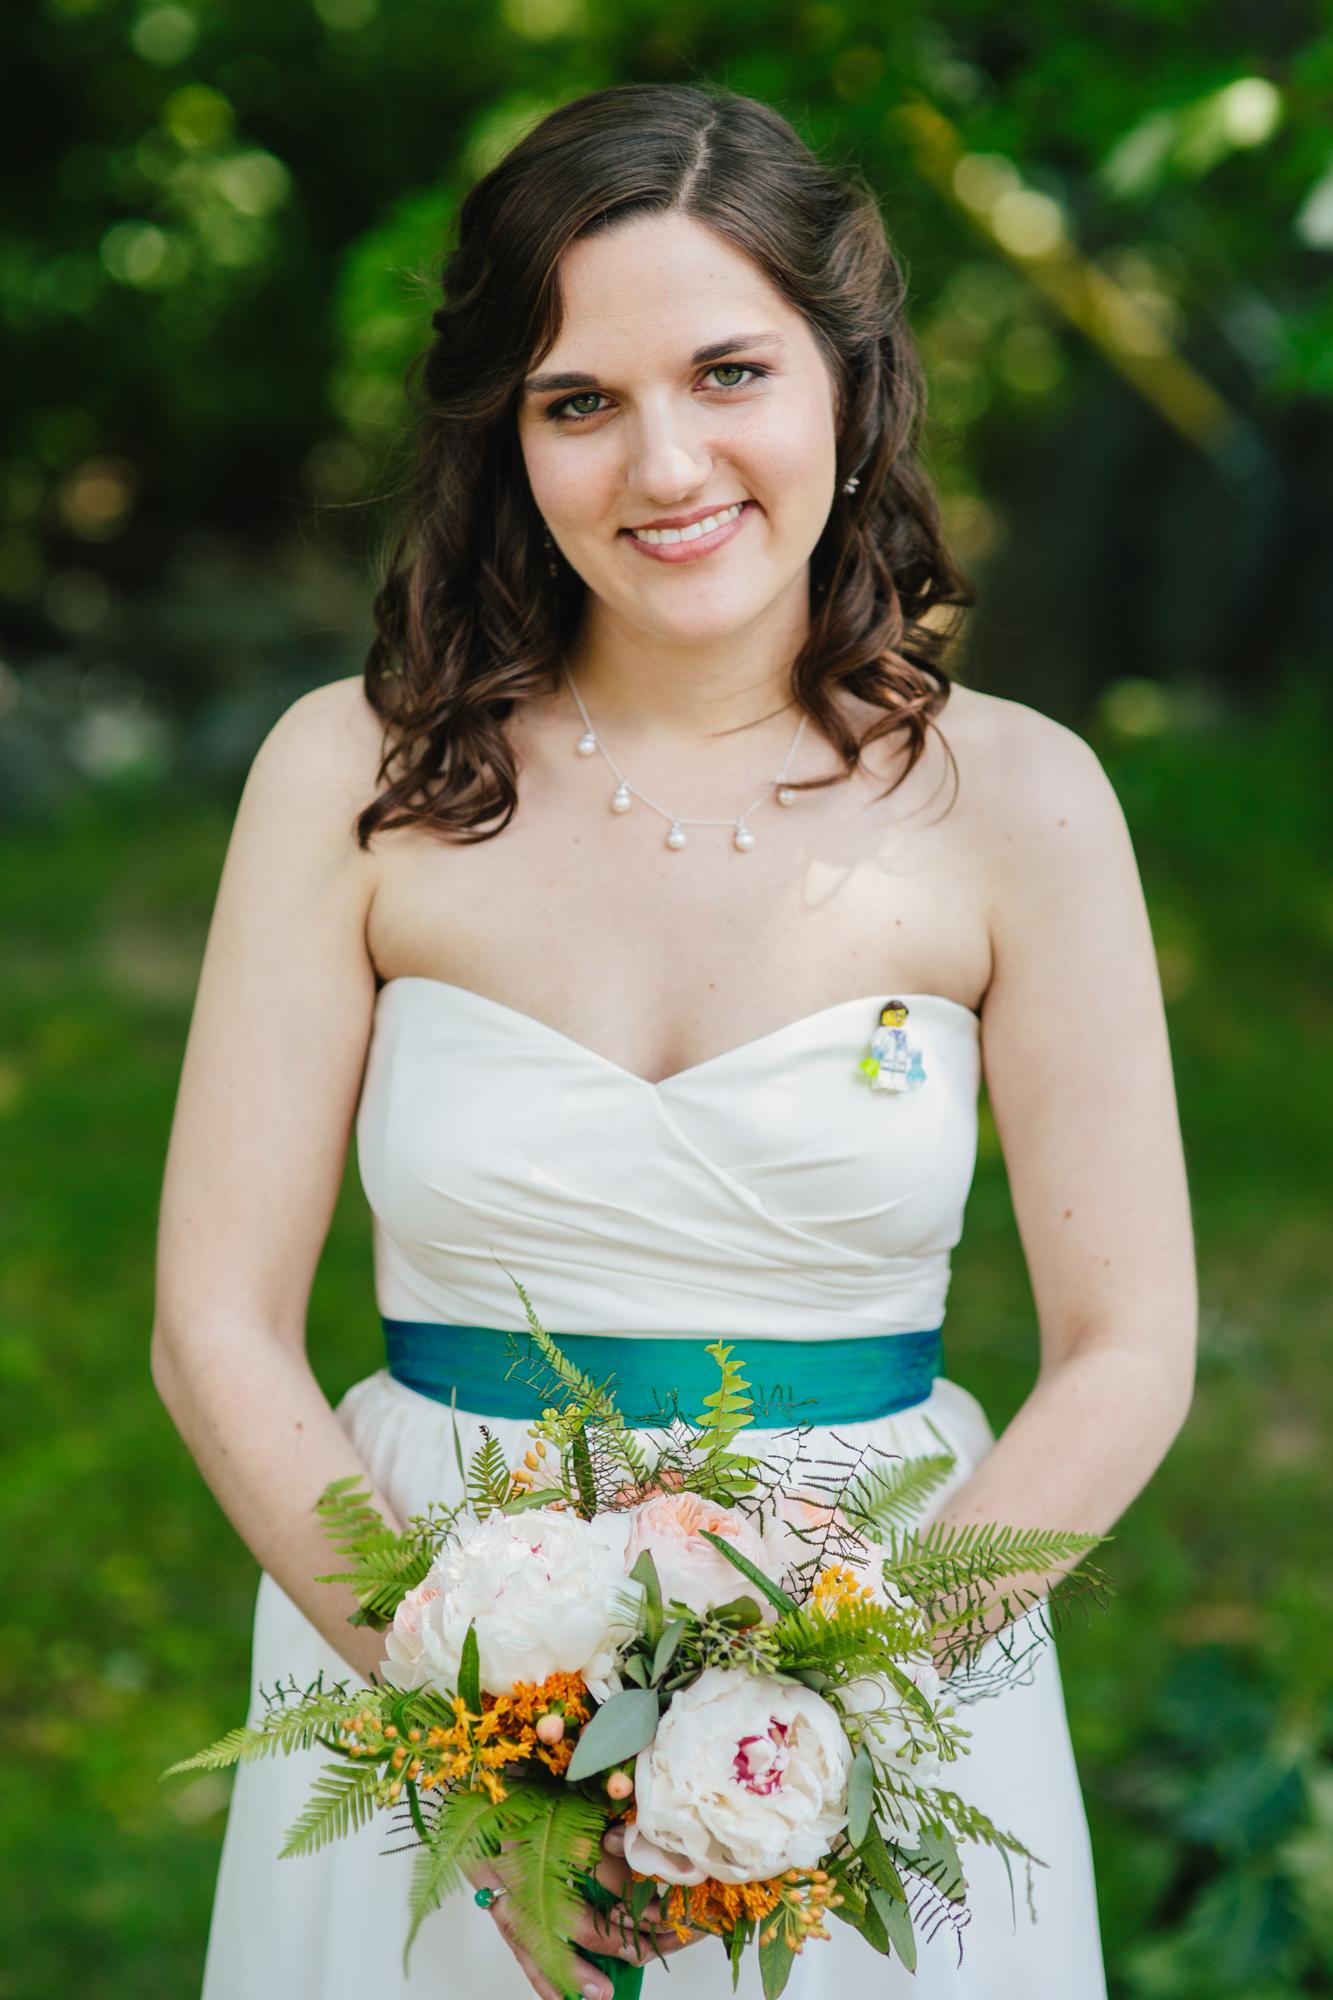 The-Shovel-Handle-Inn-Barn-Wedding-New-Hampshire-New-England-Wedding-Photography-11.jpg